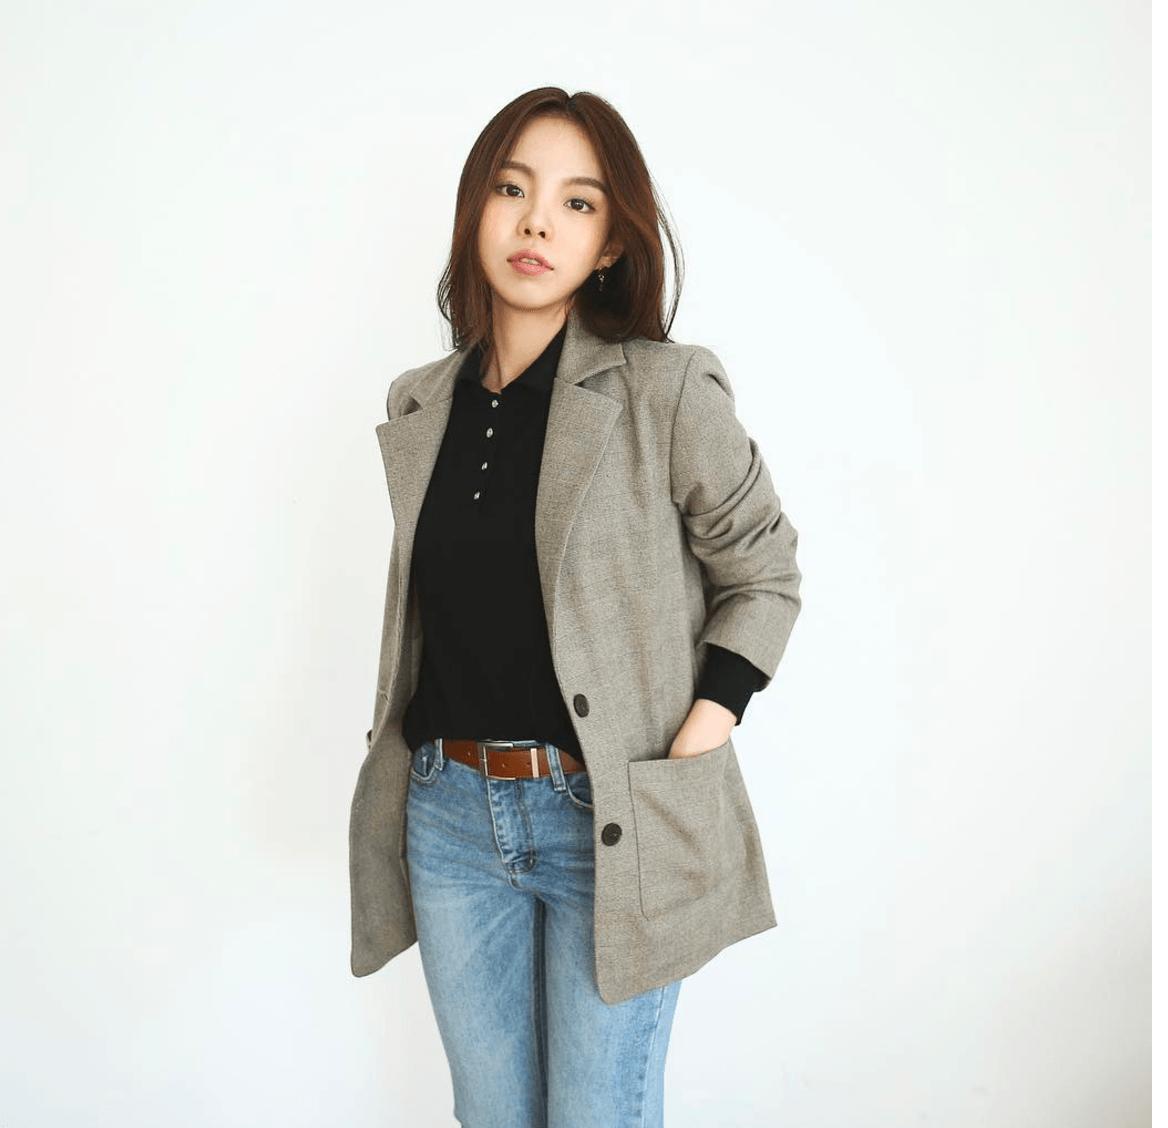 Bts Hope Older Sister Drop Dead Gorgeous Koreaboo